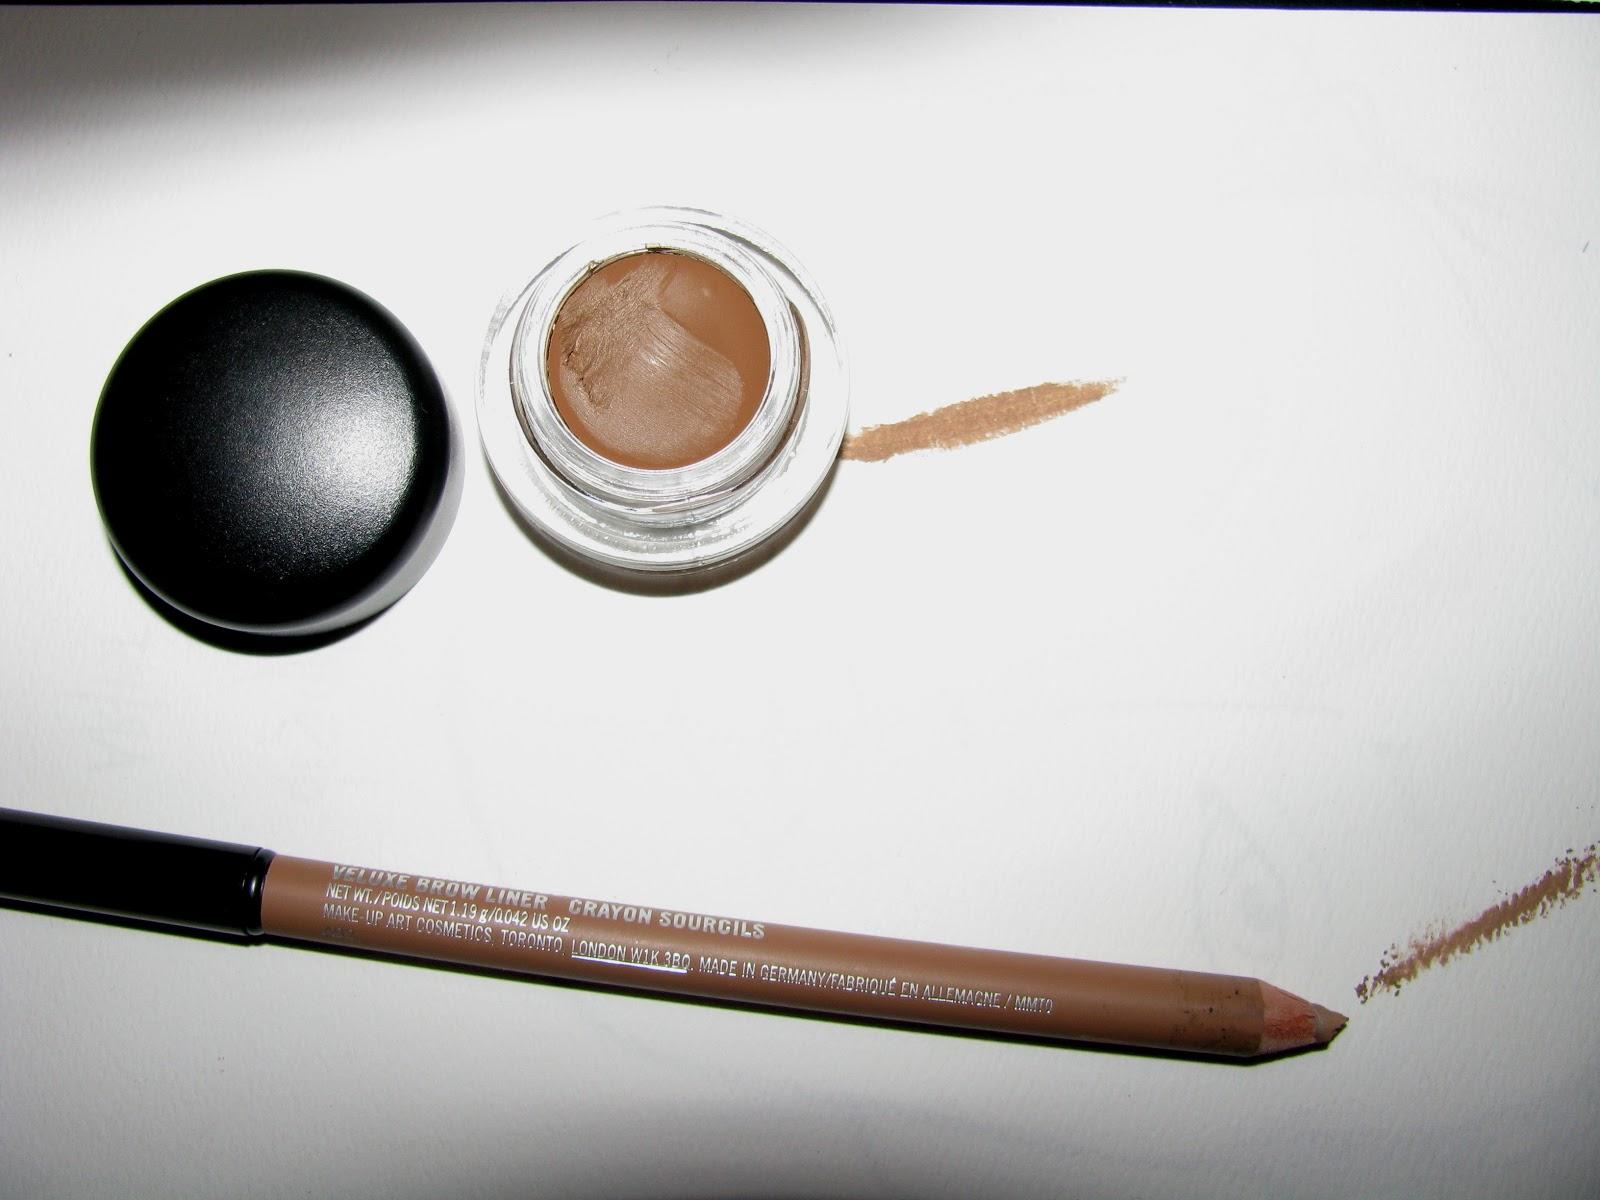 The Beauty Alchemist Mac Strawberry Blonde Eyebrow Pencil Dirty